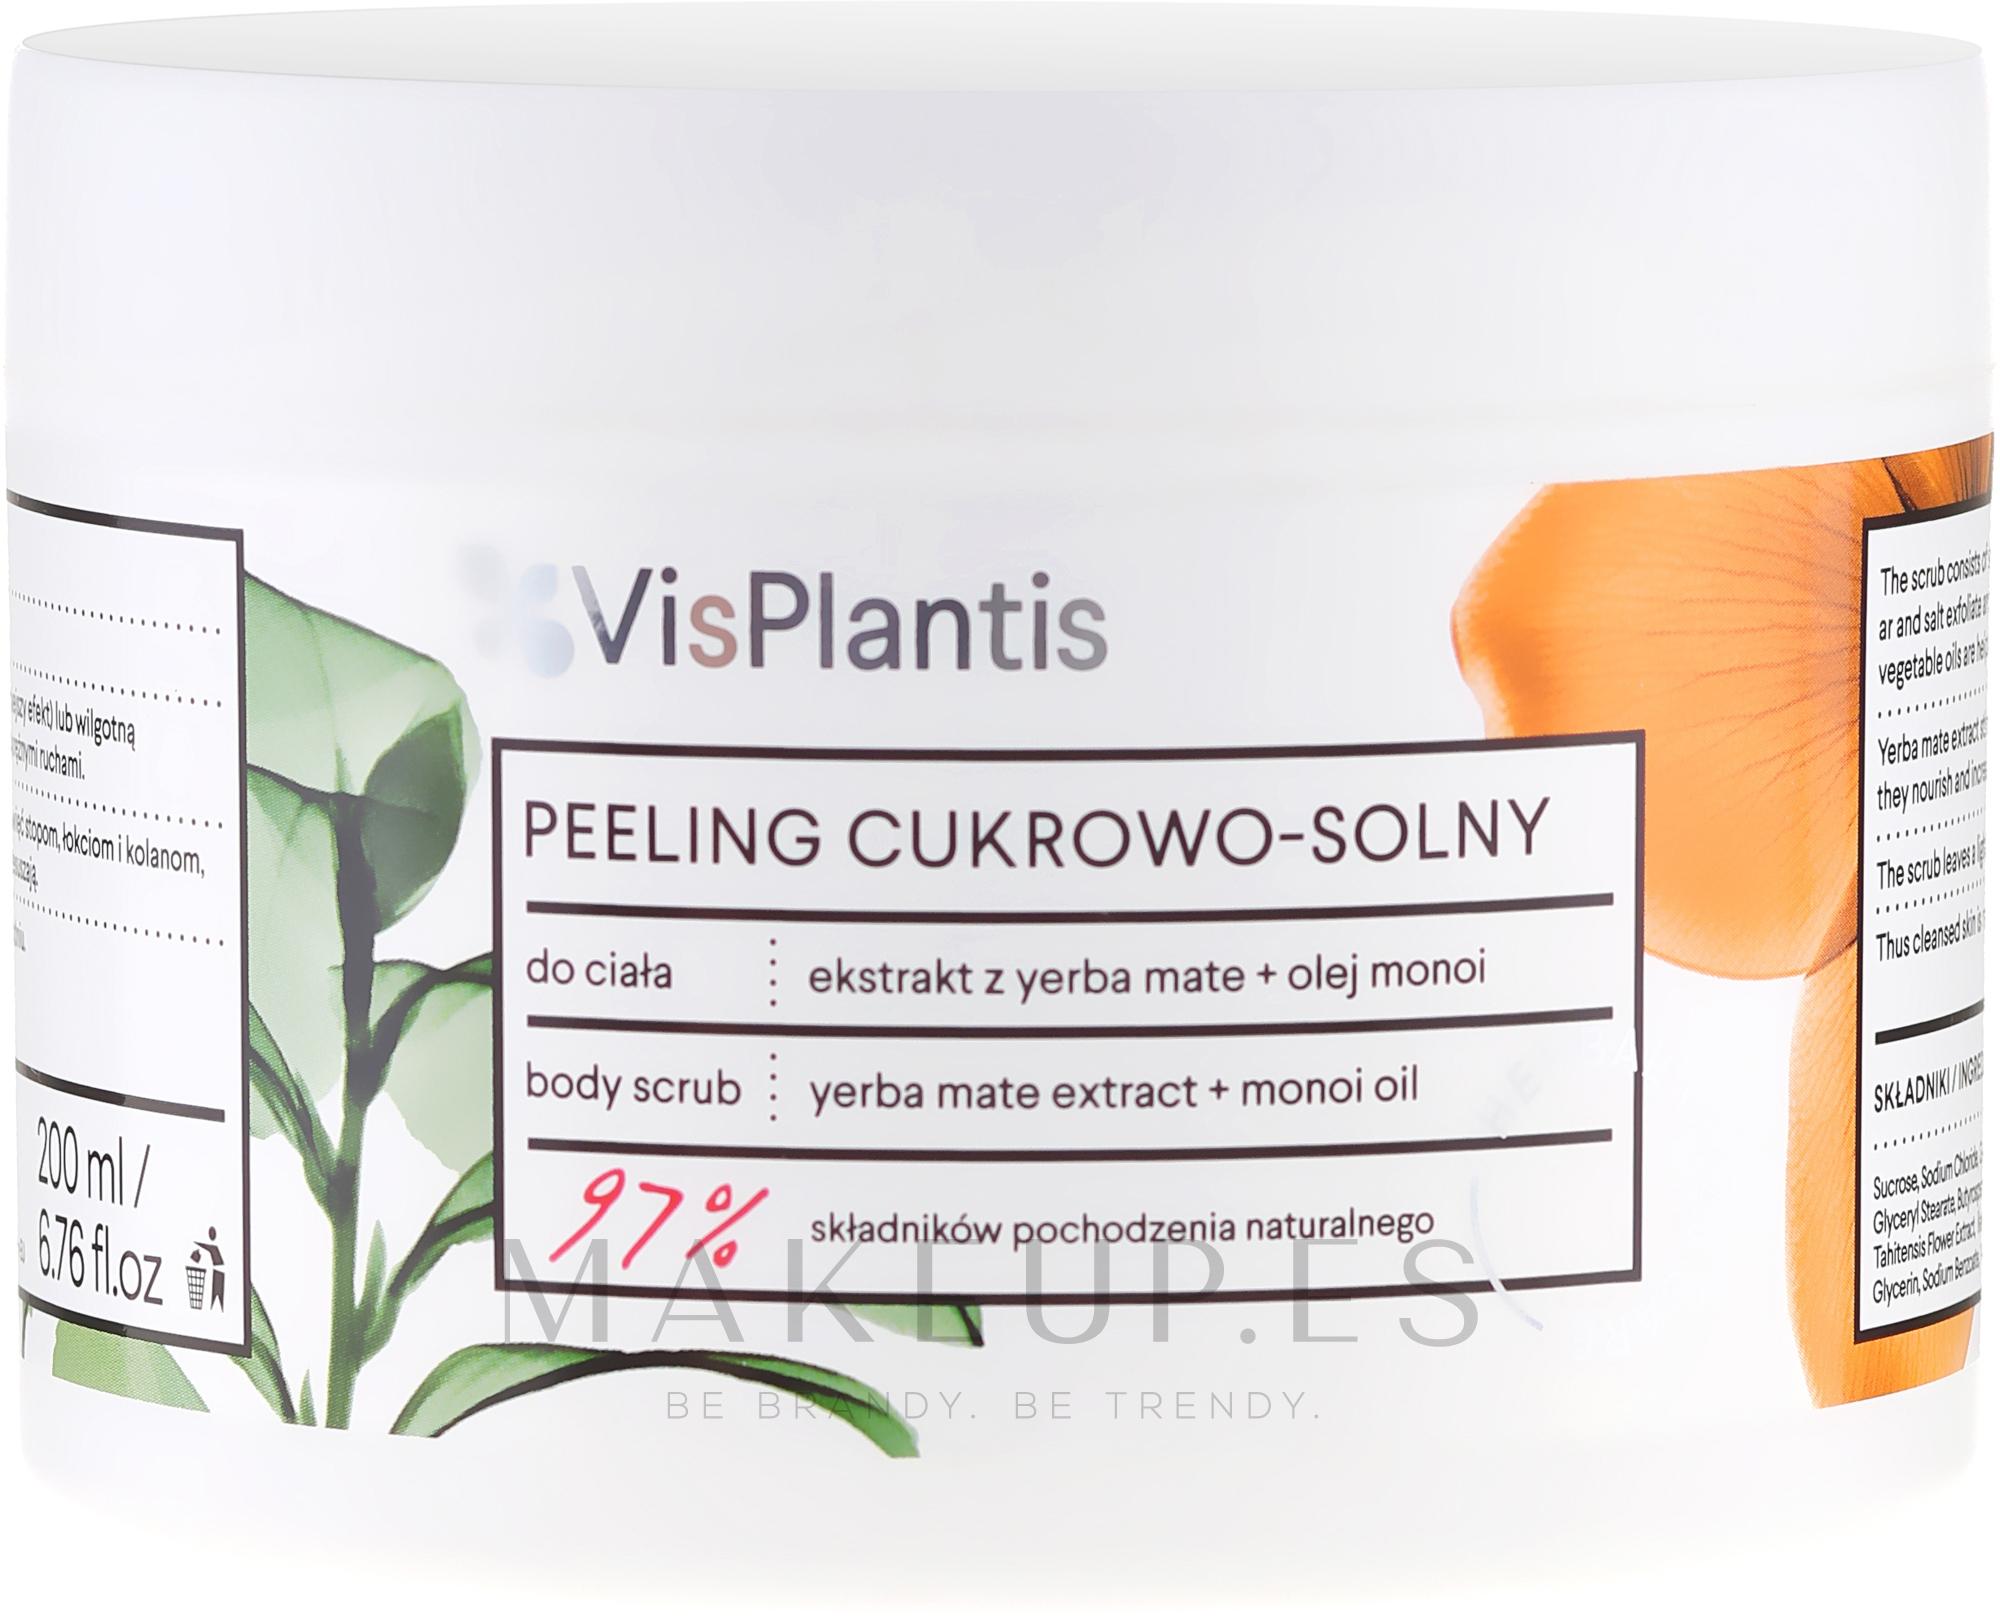 Exfoliante corporal con extracto de yerba mate & aceite de monoi - Vis Plantis Sugar & Salt Body Scrub — imagen 200 ml